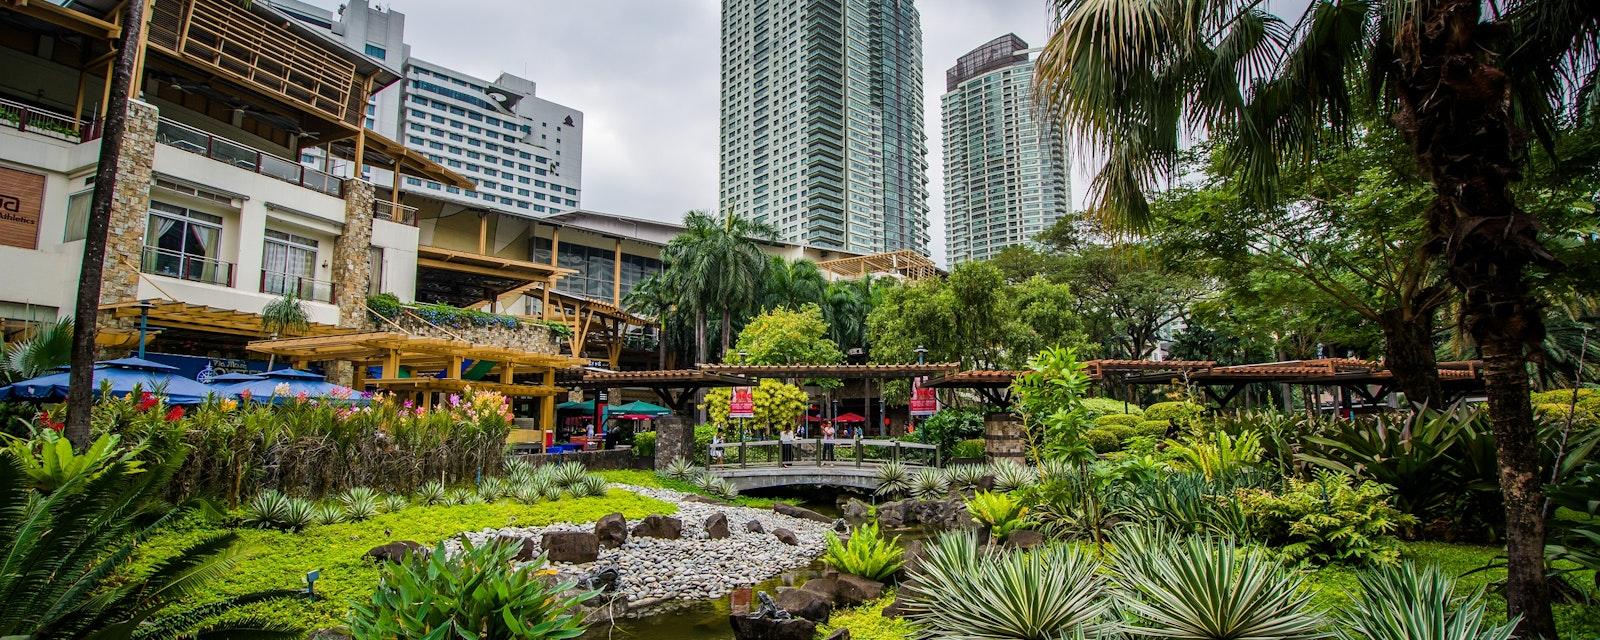 Gardens,And,Skyscrapers,At,Greenbelt,Park,,In,Ayala,,Makati,,Metro